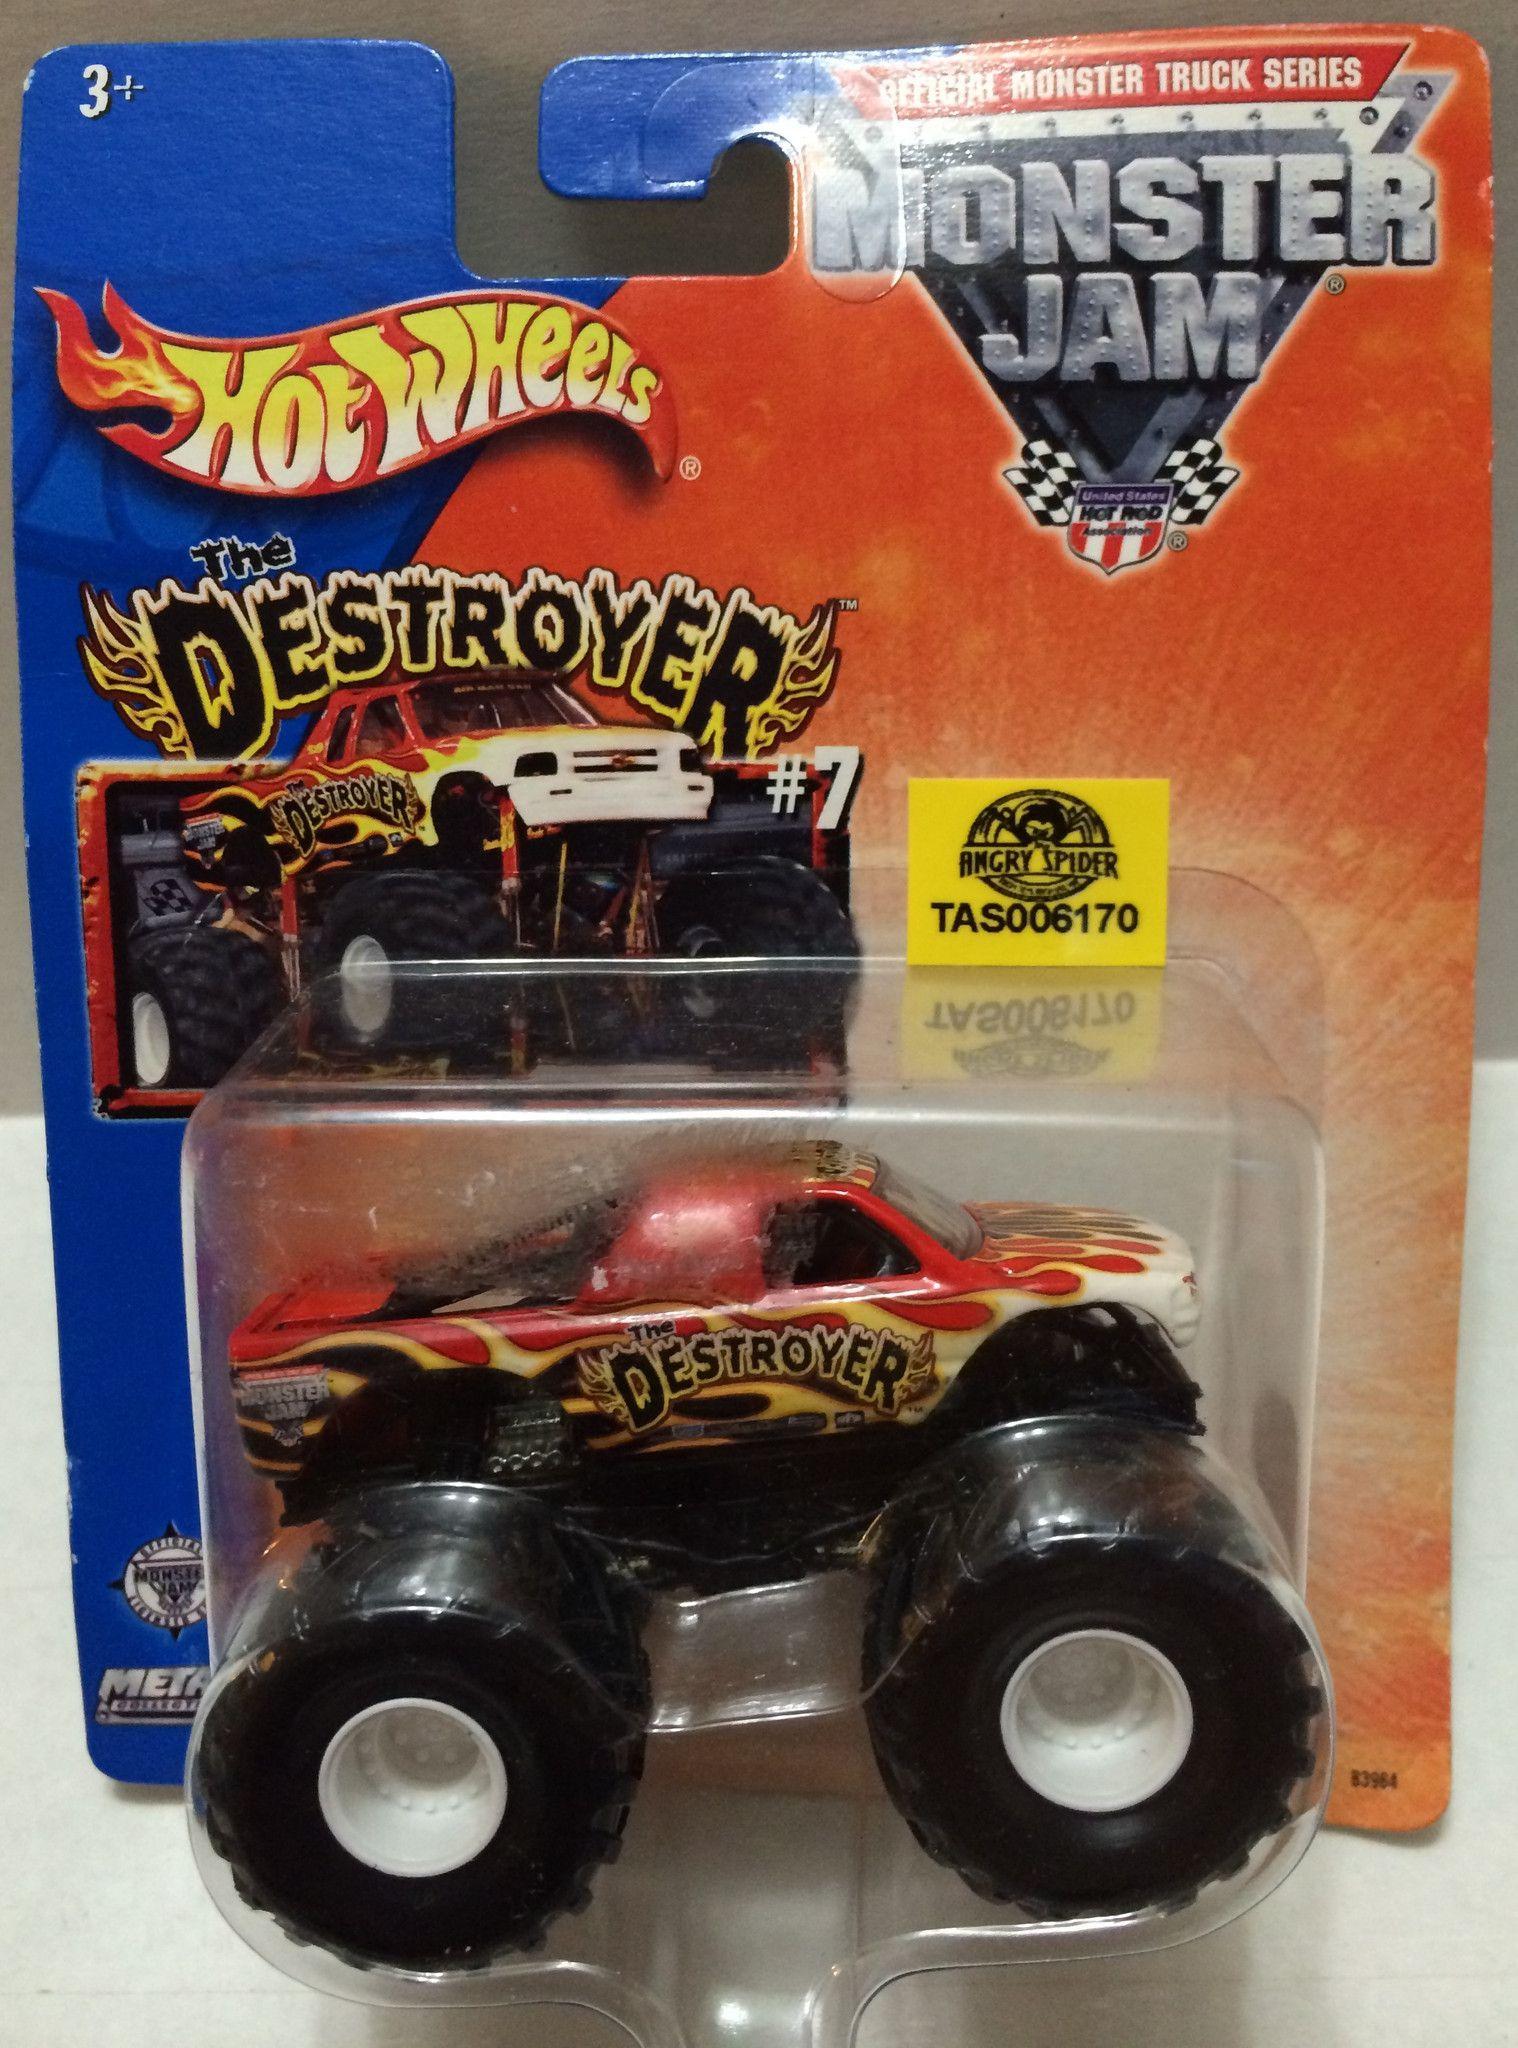 Mattel legends 1 24 1969 hot wheels twin mill concept car electronic -  Tas032312 2013 Mattel Hot Wheels Monster Jam The Destroyer Die Cast Truck